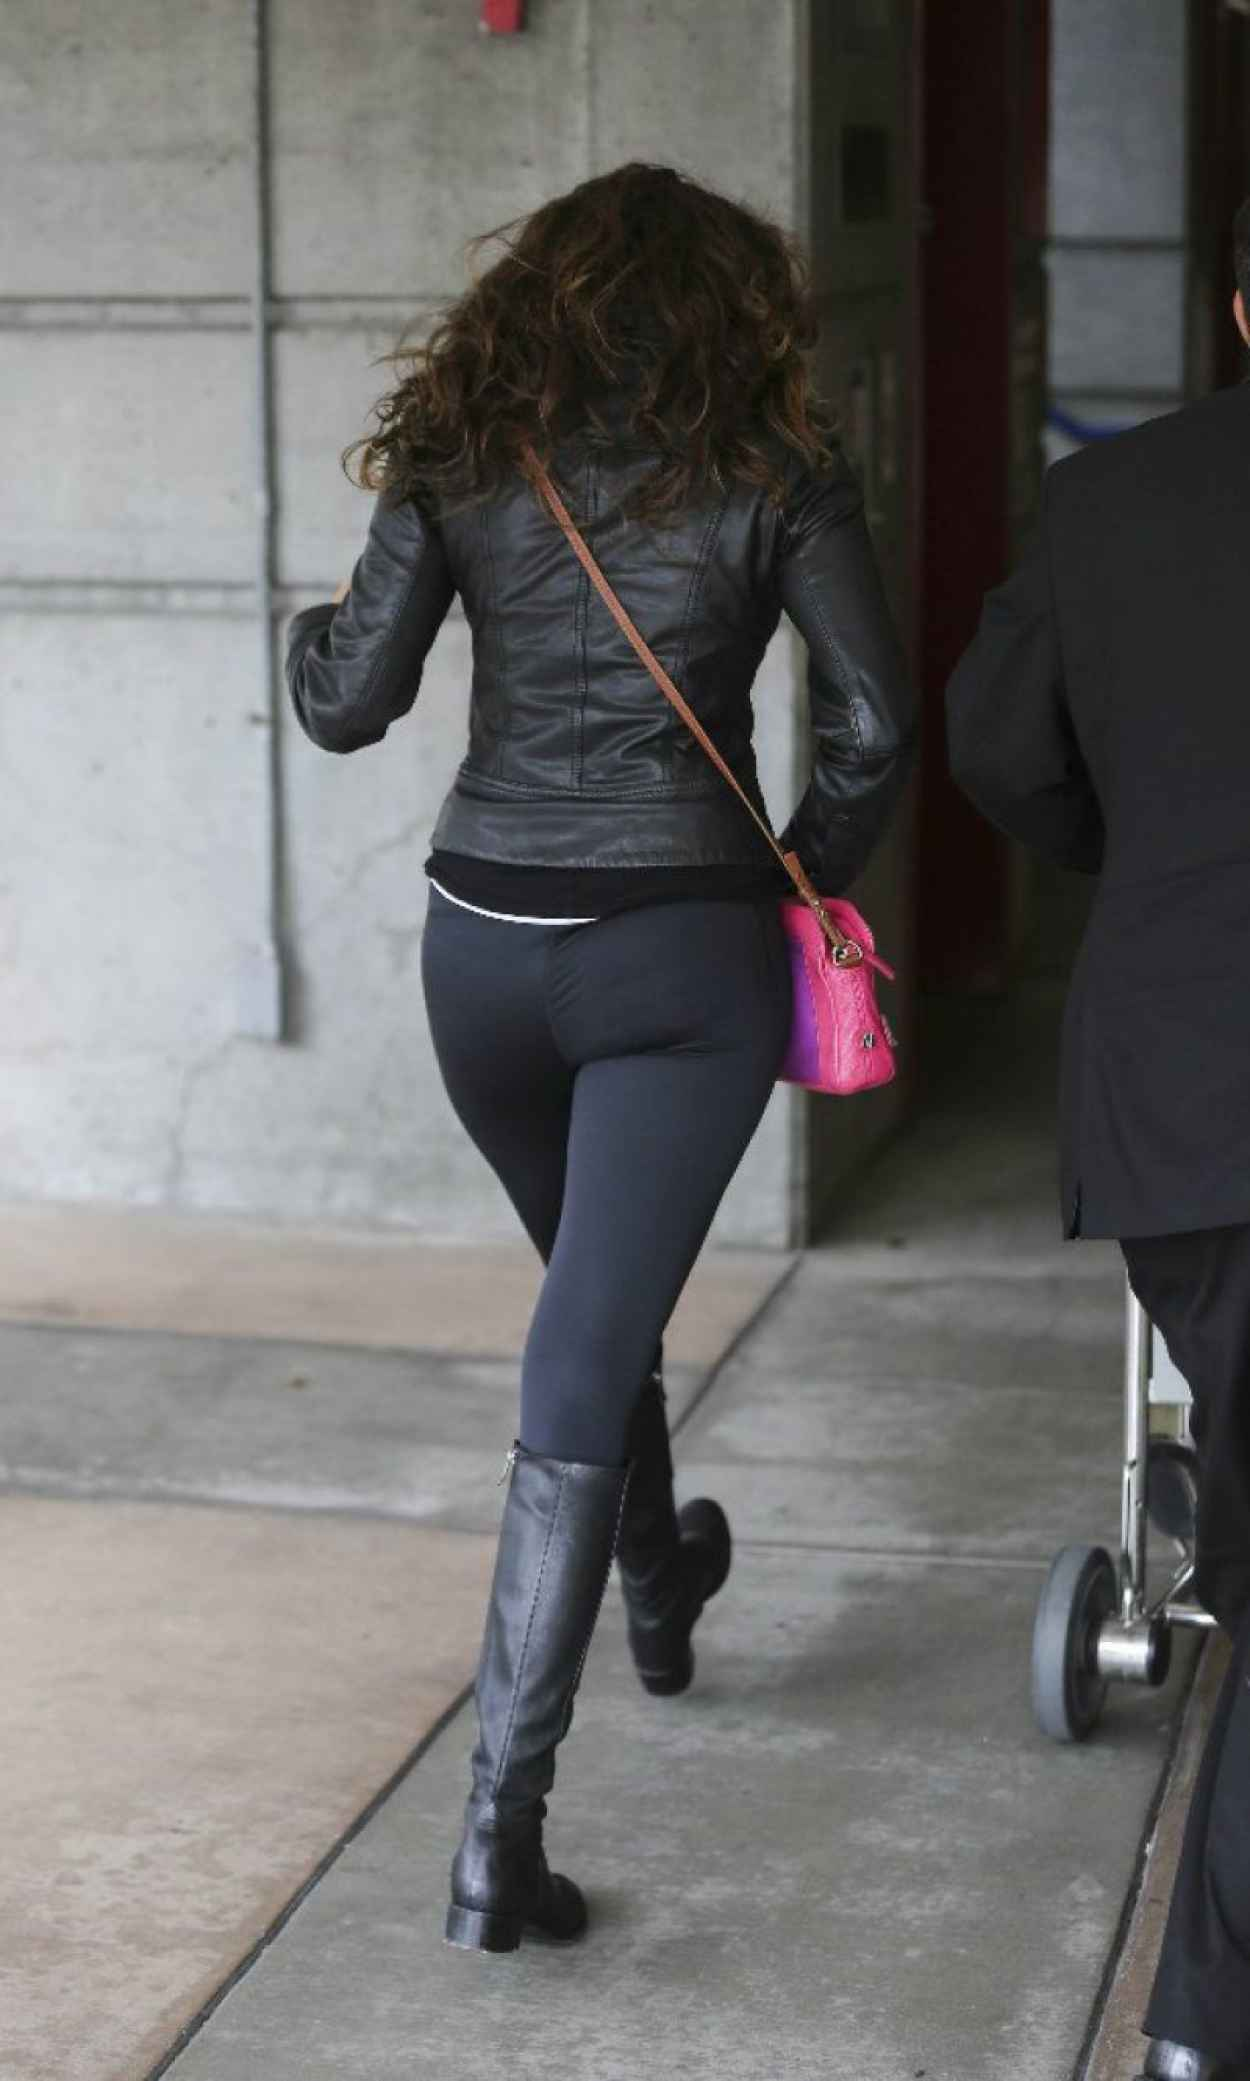 Nina Dobrev - Booty in Tights at LAX Airport - March 2015-1